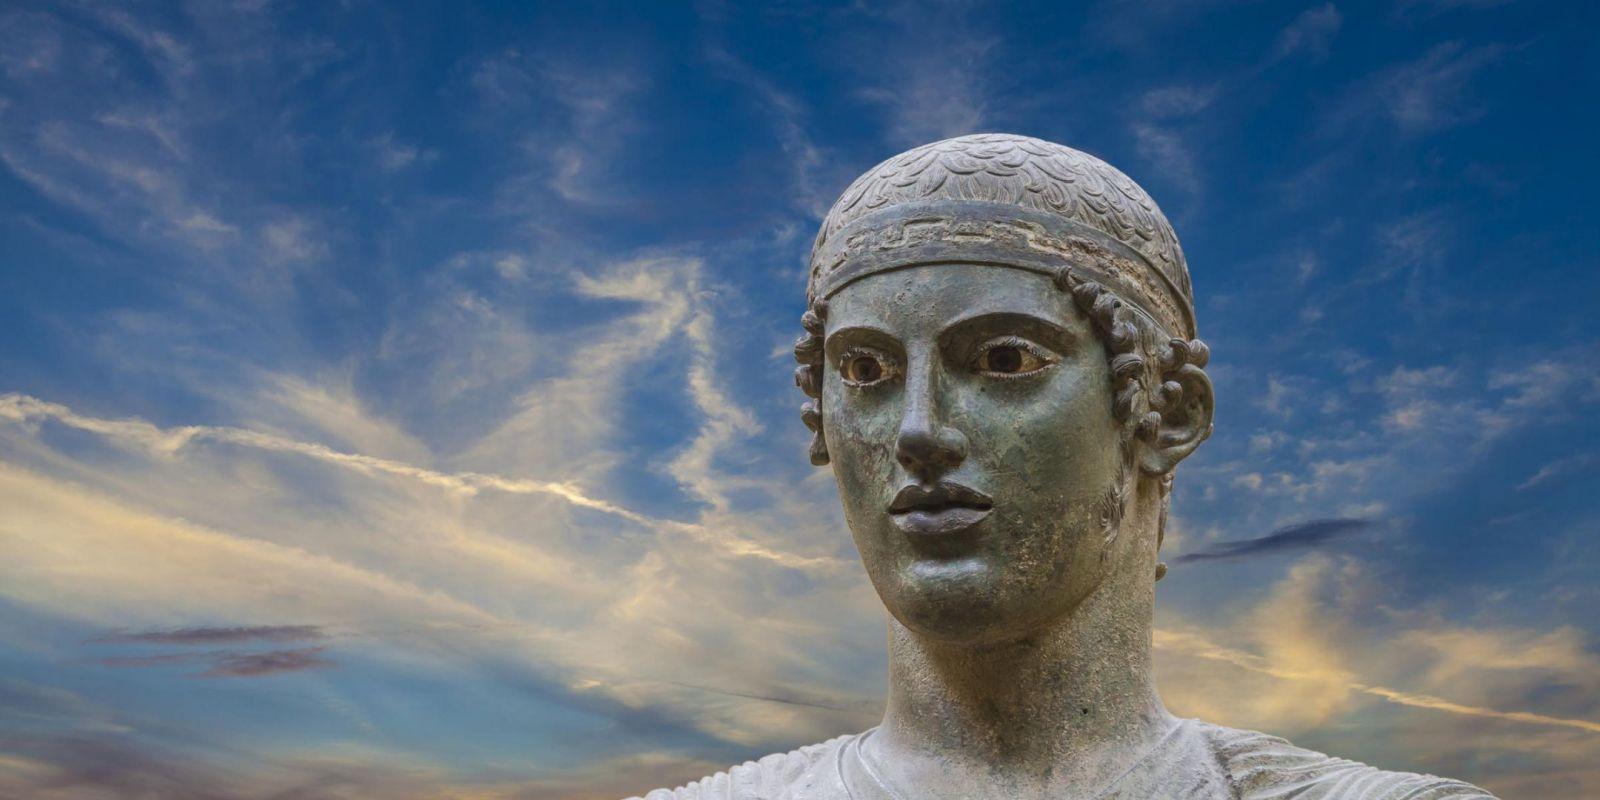 Delphi, Greece - Discover Greece in 11 days tour from Igoumenitsa. UNESCO sites, fortresses, monasteries. Private tour with minivan from Monterrasol Travel.